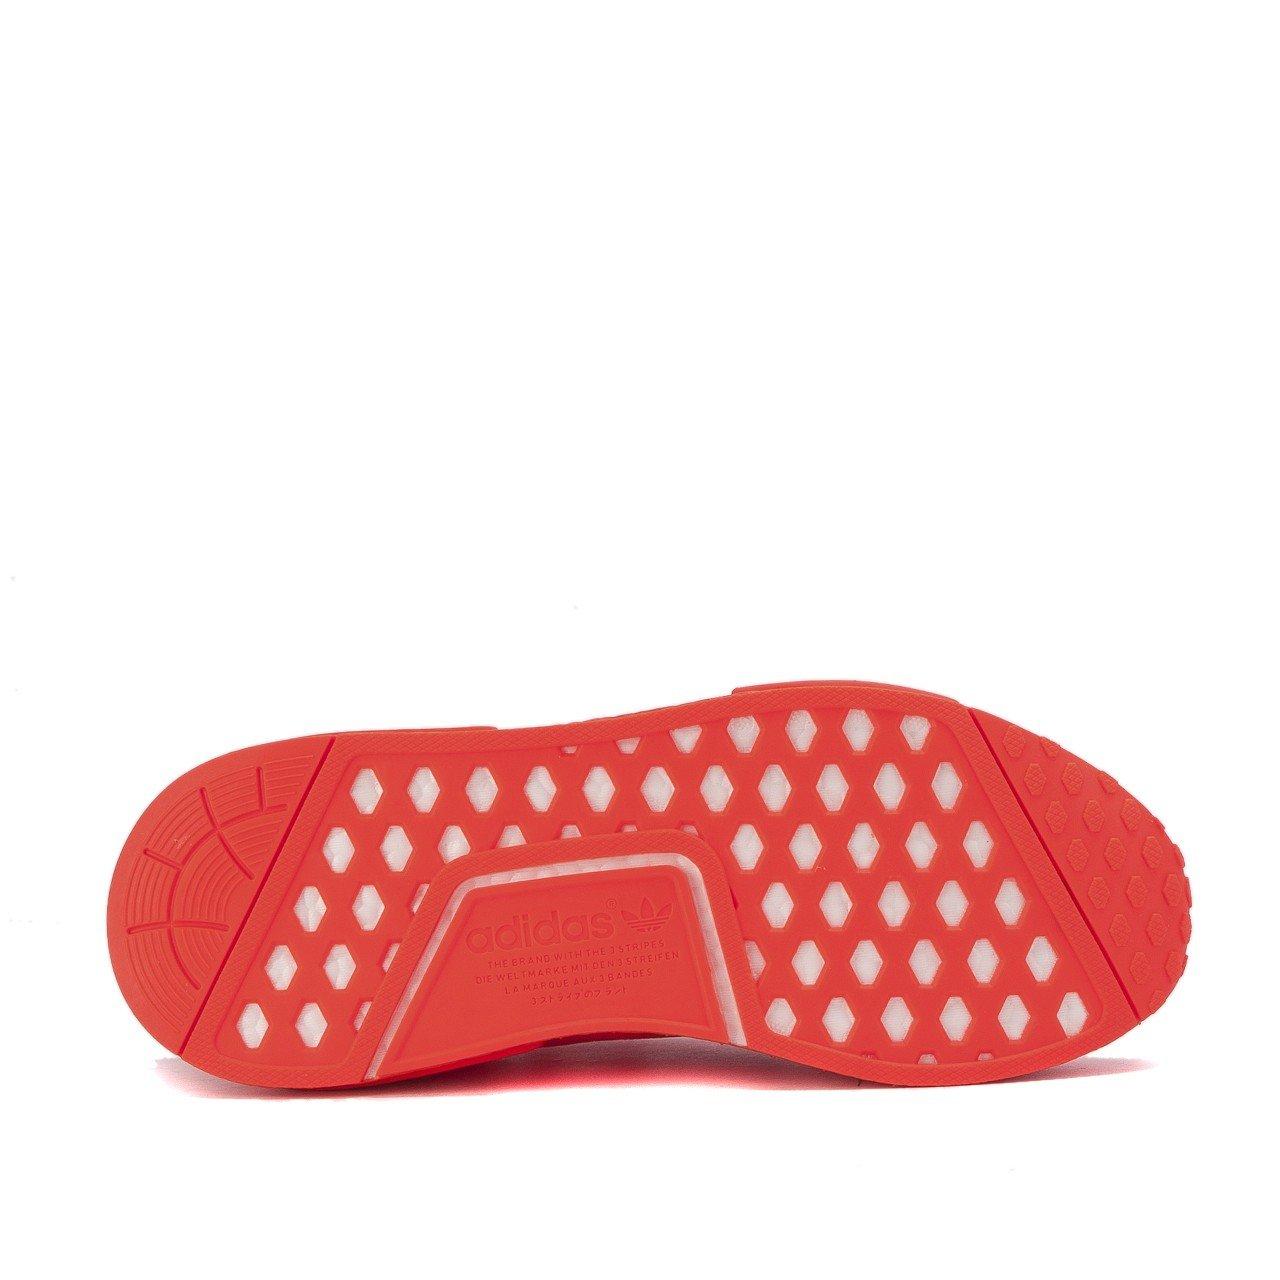 Adidas Herren NMD_R1 NMD_R1 Herren PK Fitnessschuhe Mehrfarbig 5b0d5a